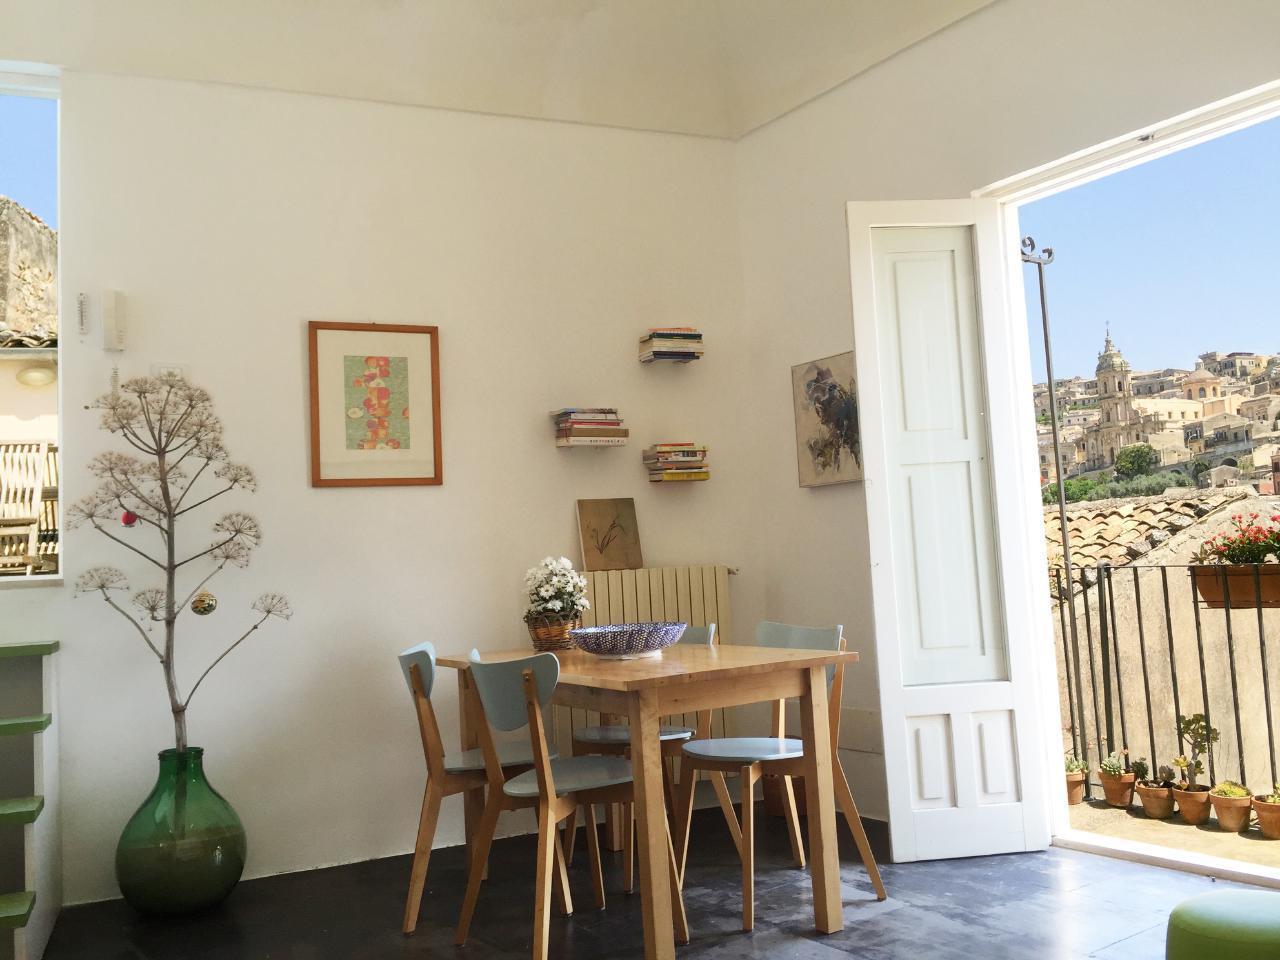 Maison de vacances Terrazza Barocca (1648450), Modica, Ragusa, Sicile, Italie, image 9